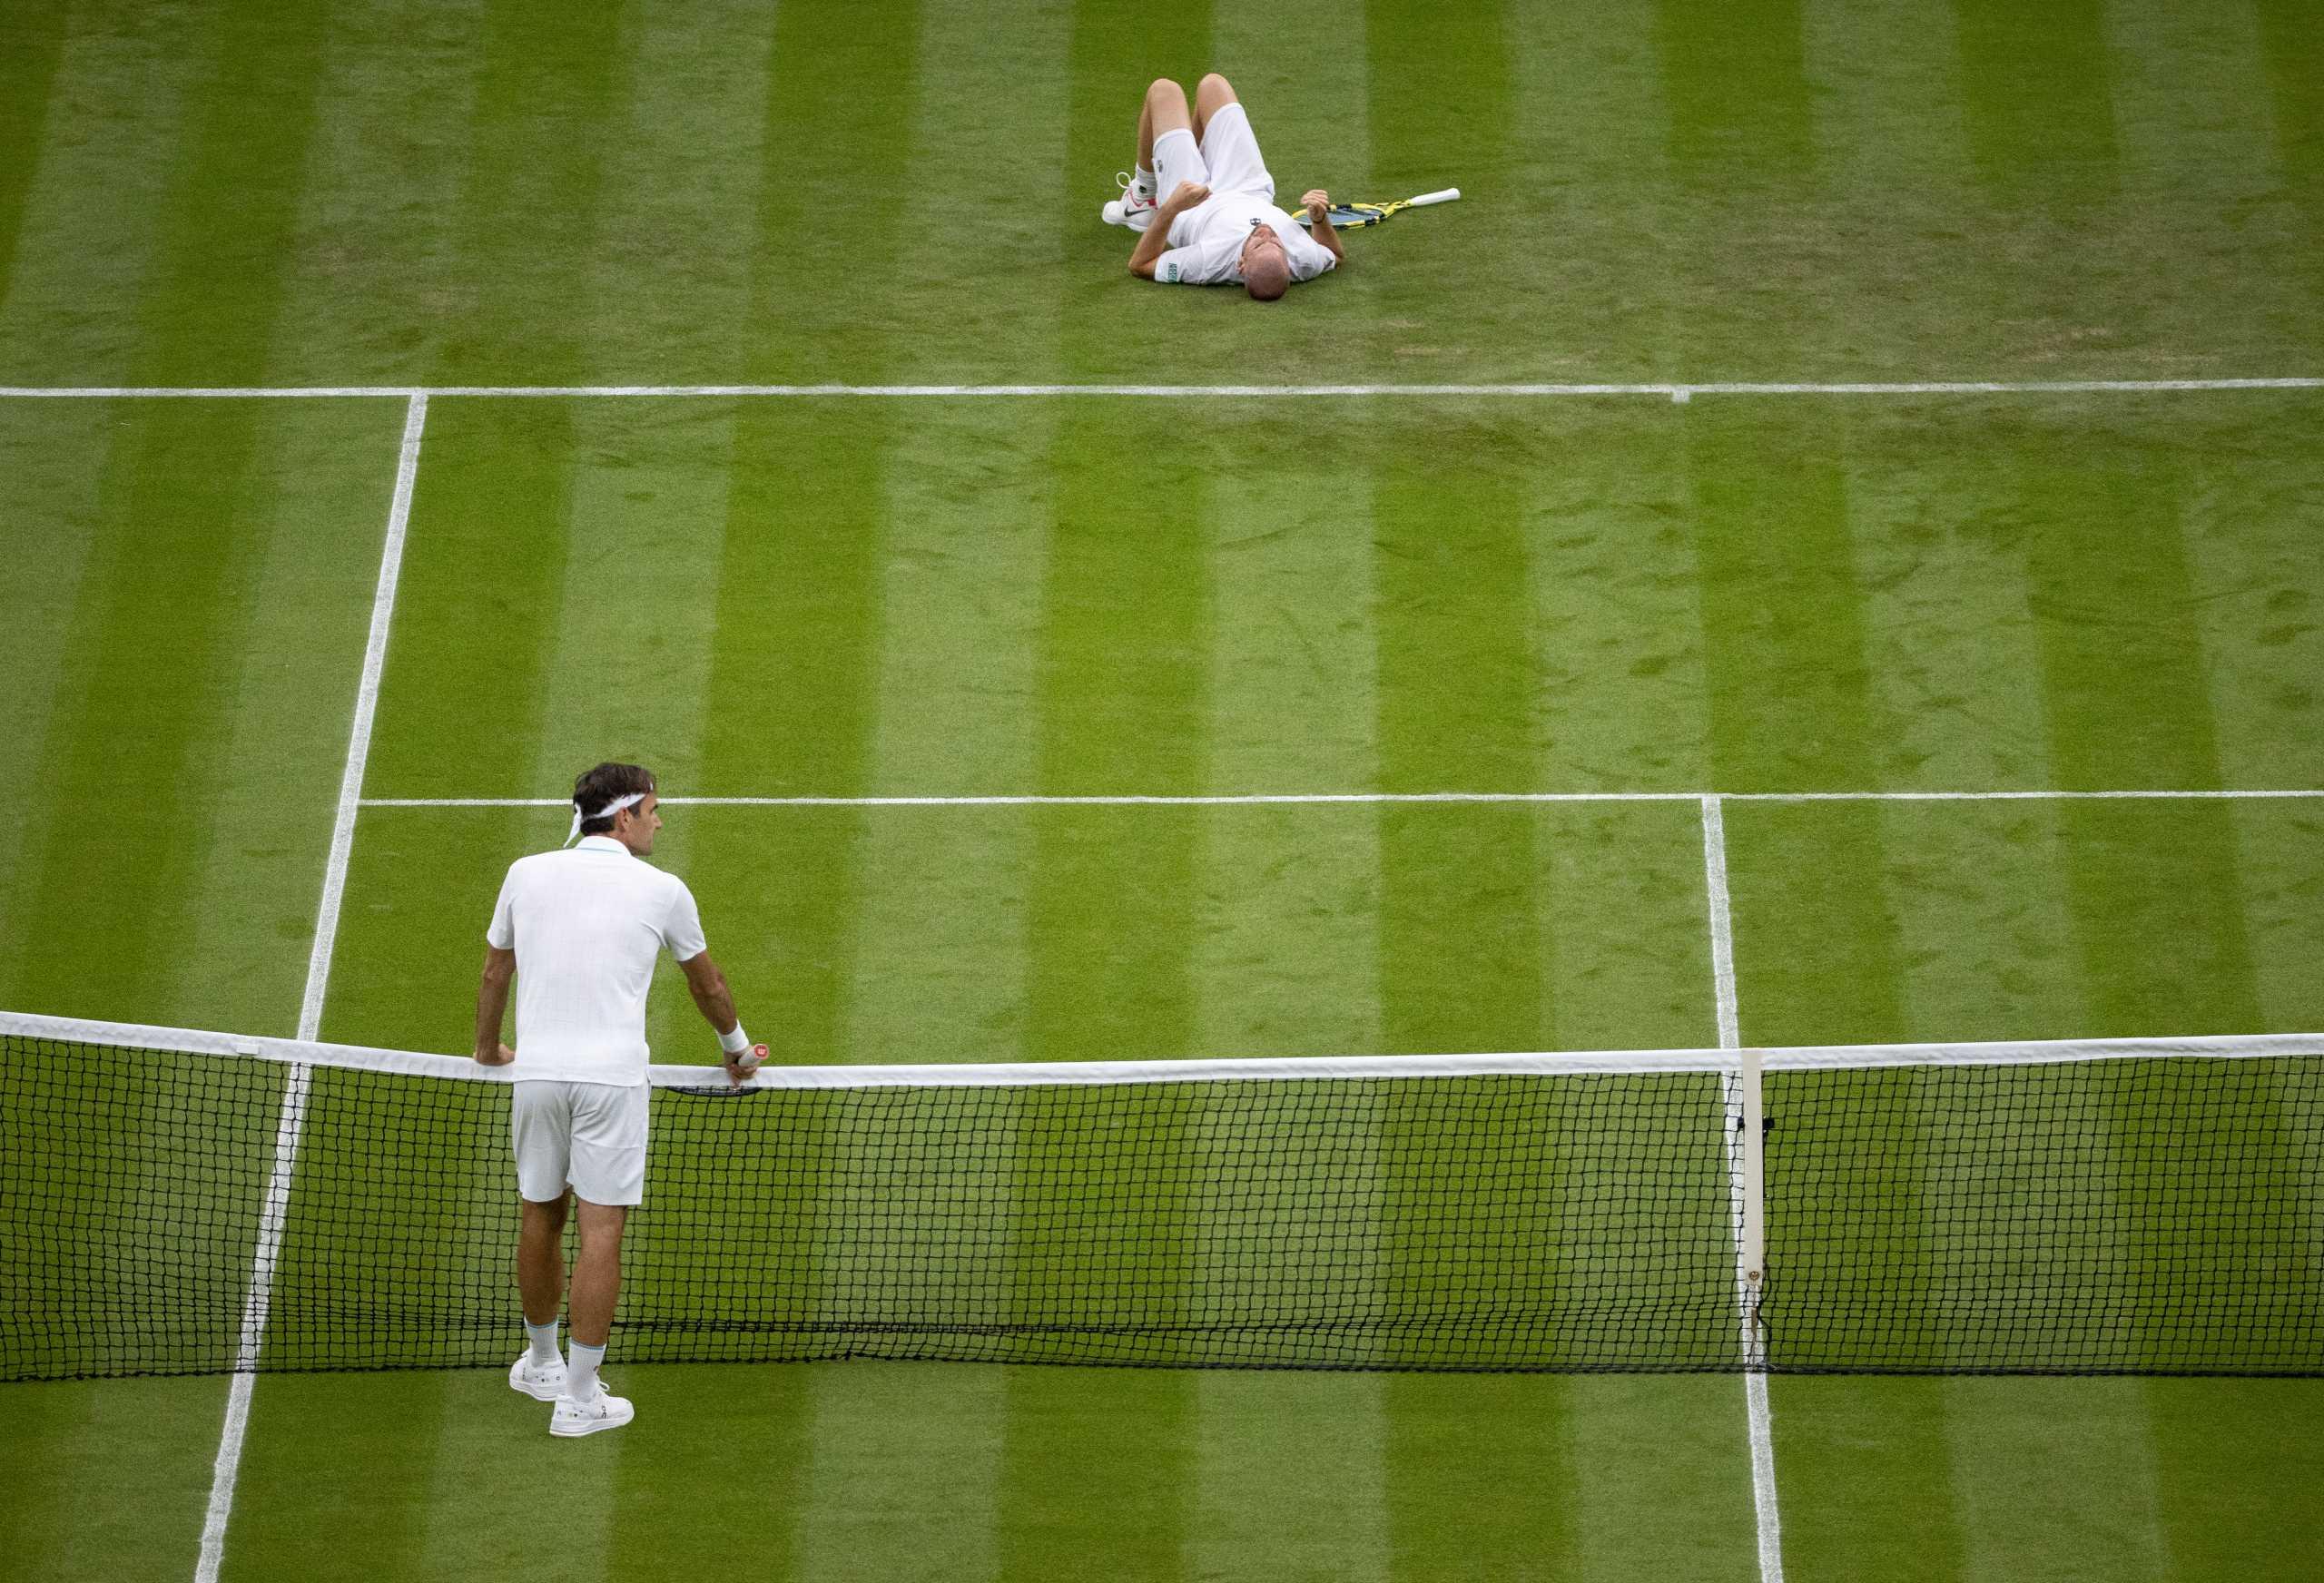 Wimbledon: Προκρίθηκε με 2-2 ο Φέντερερ